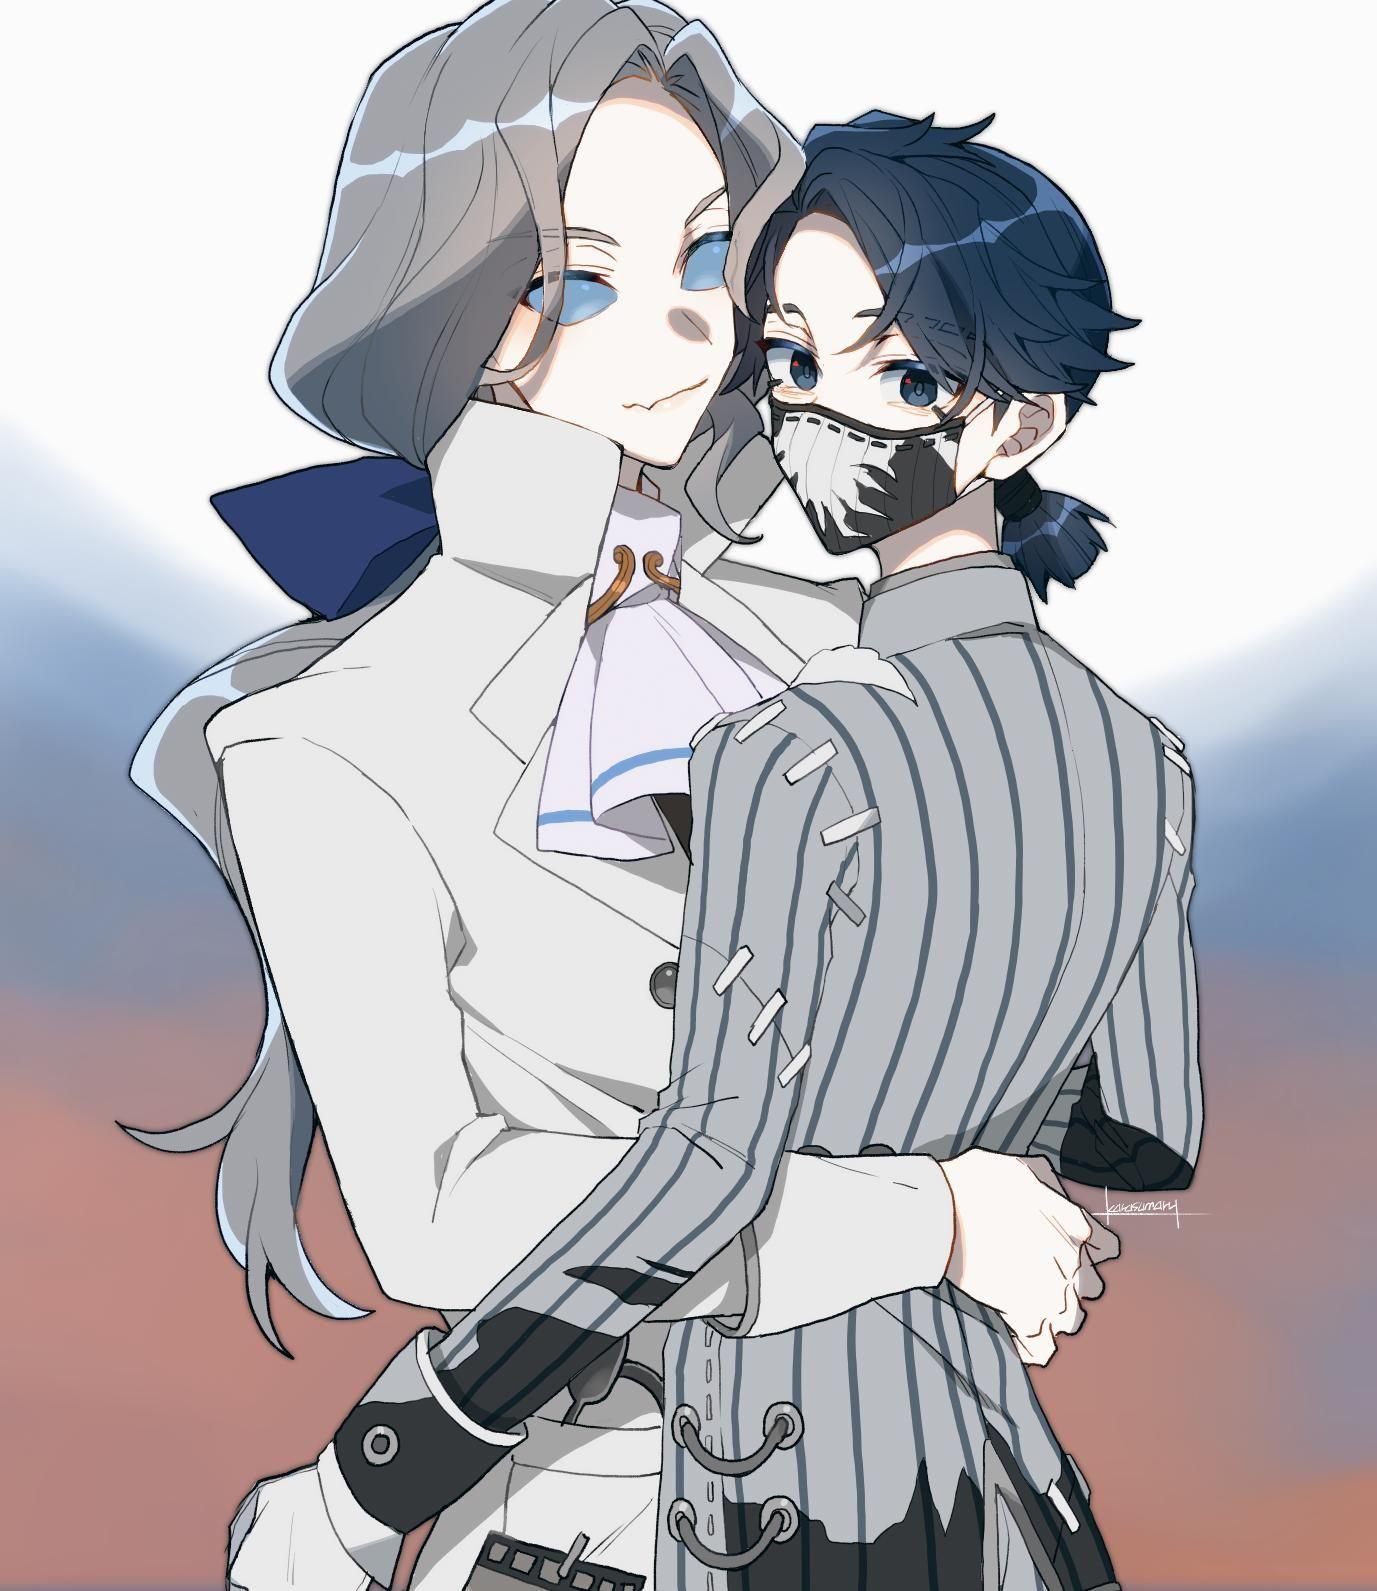 Chaoscafe(chaoscafehall)さん / Twitter Cặp đôi, Anime, Aesop